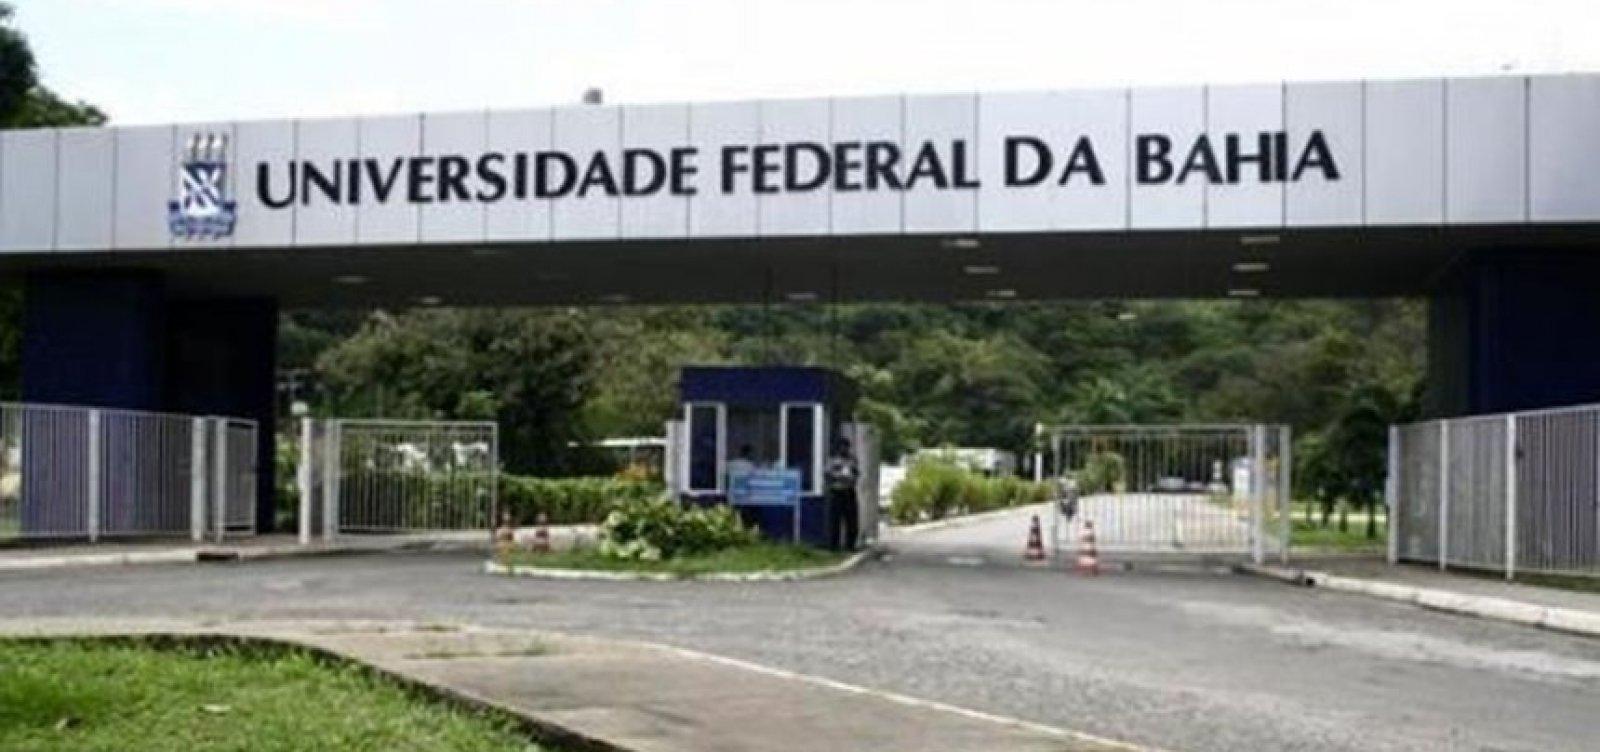 Universidades baianas perdem 786 cargos após decreto de Bolsonaro